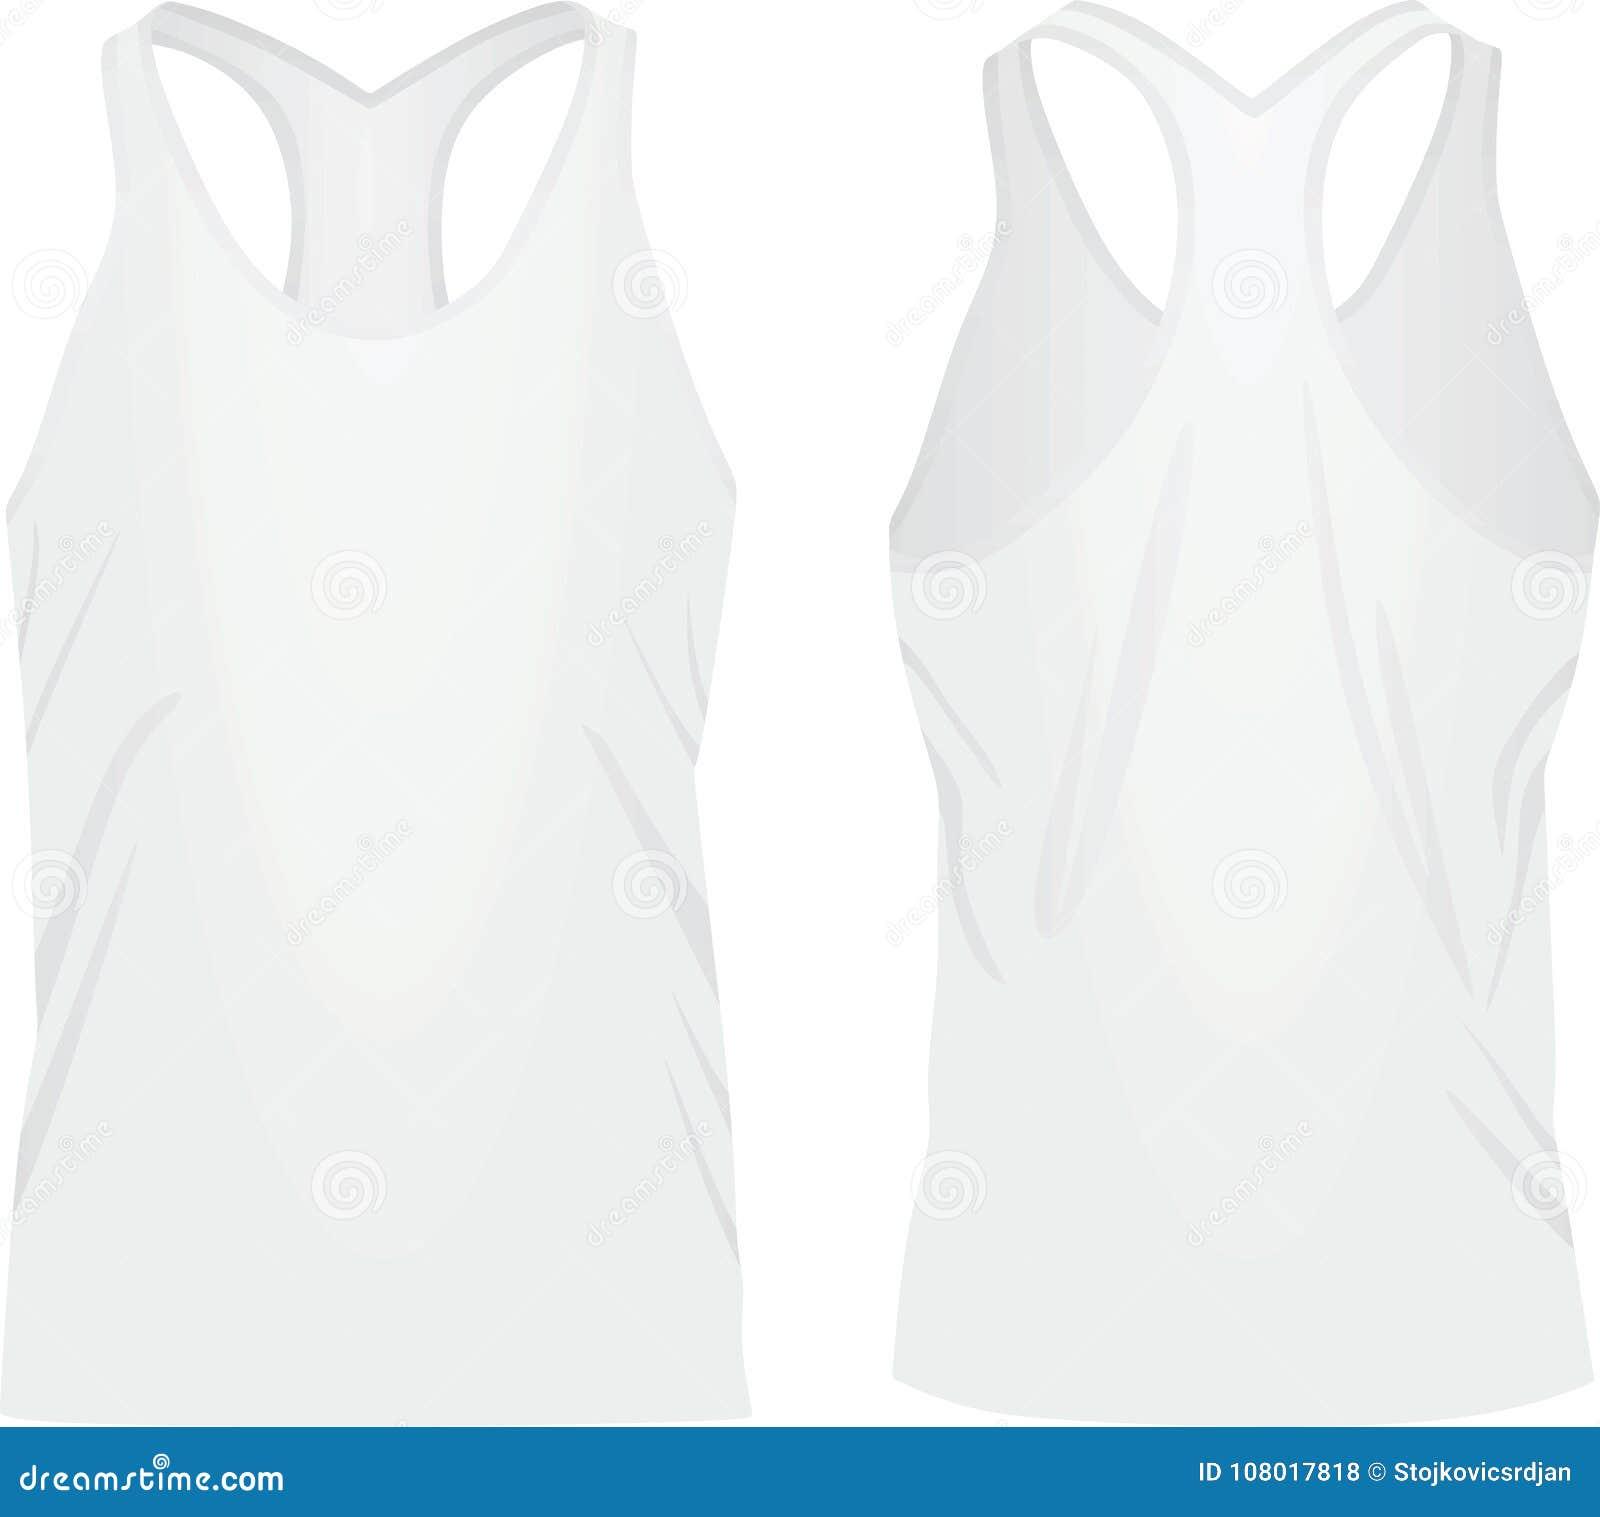 7606e8cabf4a4 White sleeveless t shirt stock vector. Illustration of blank - 108017818